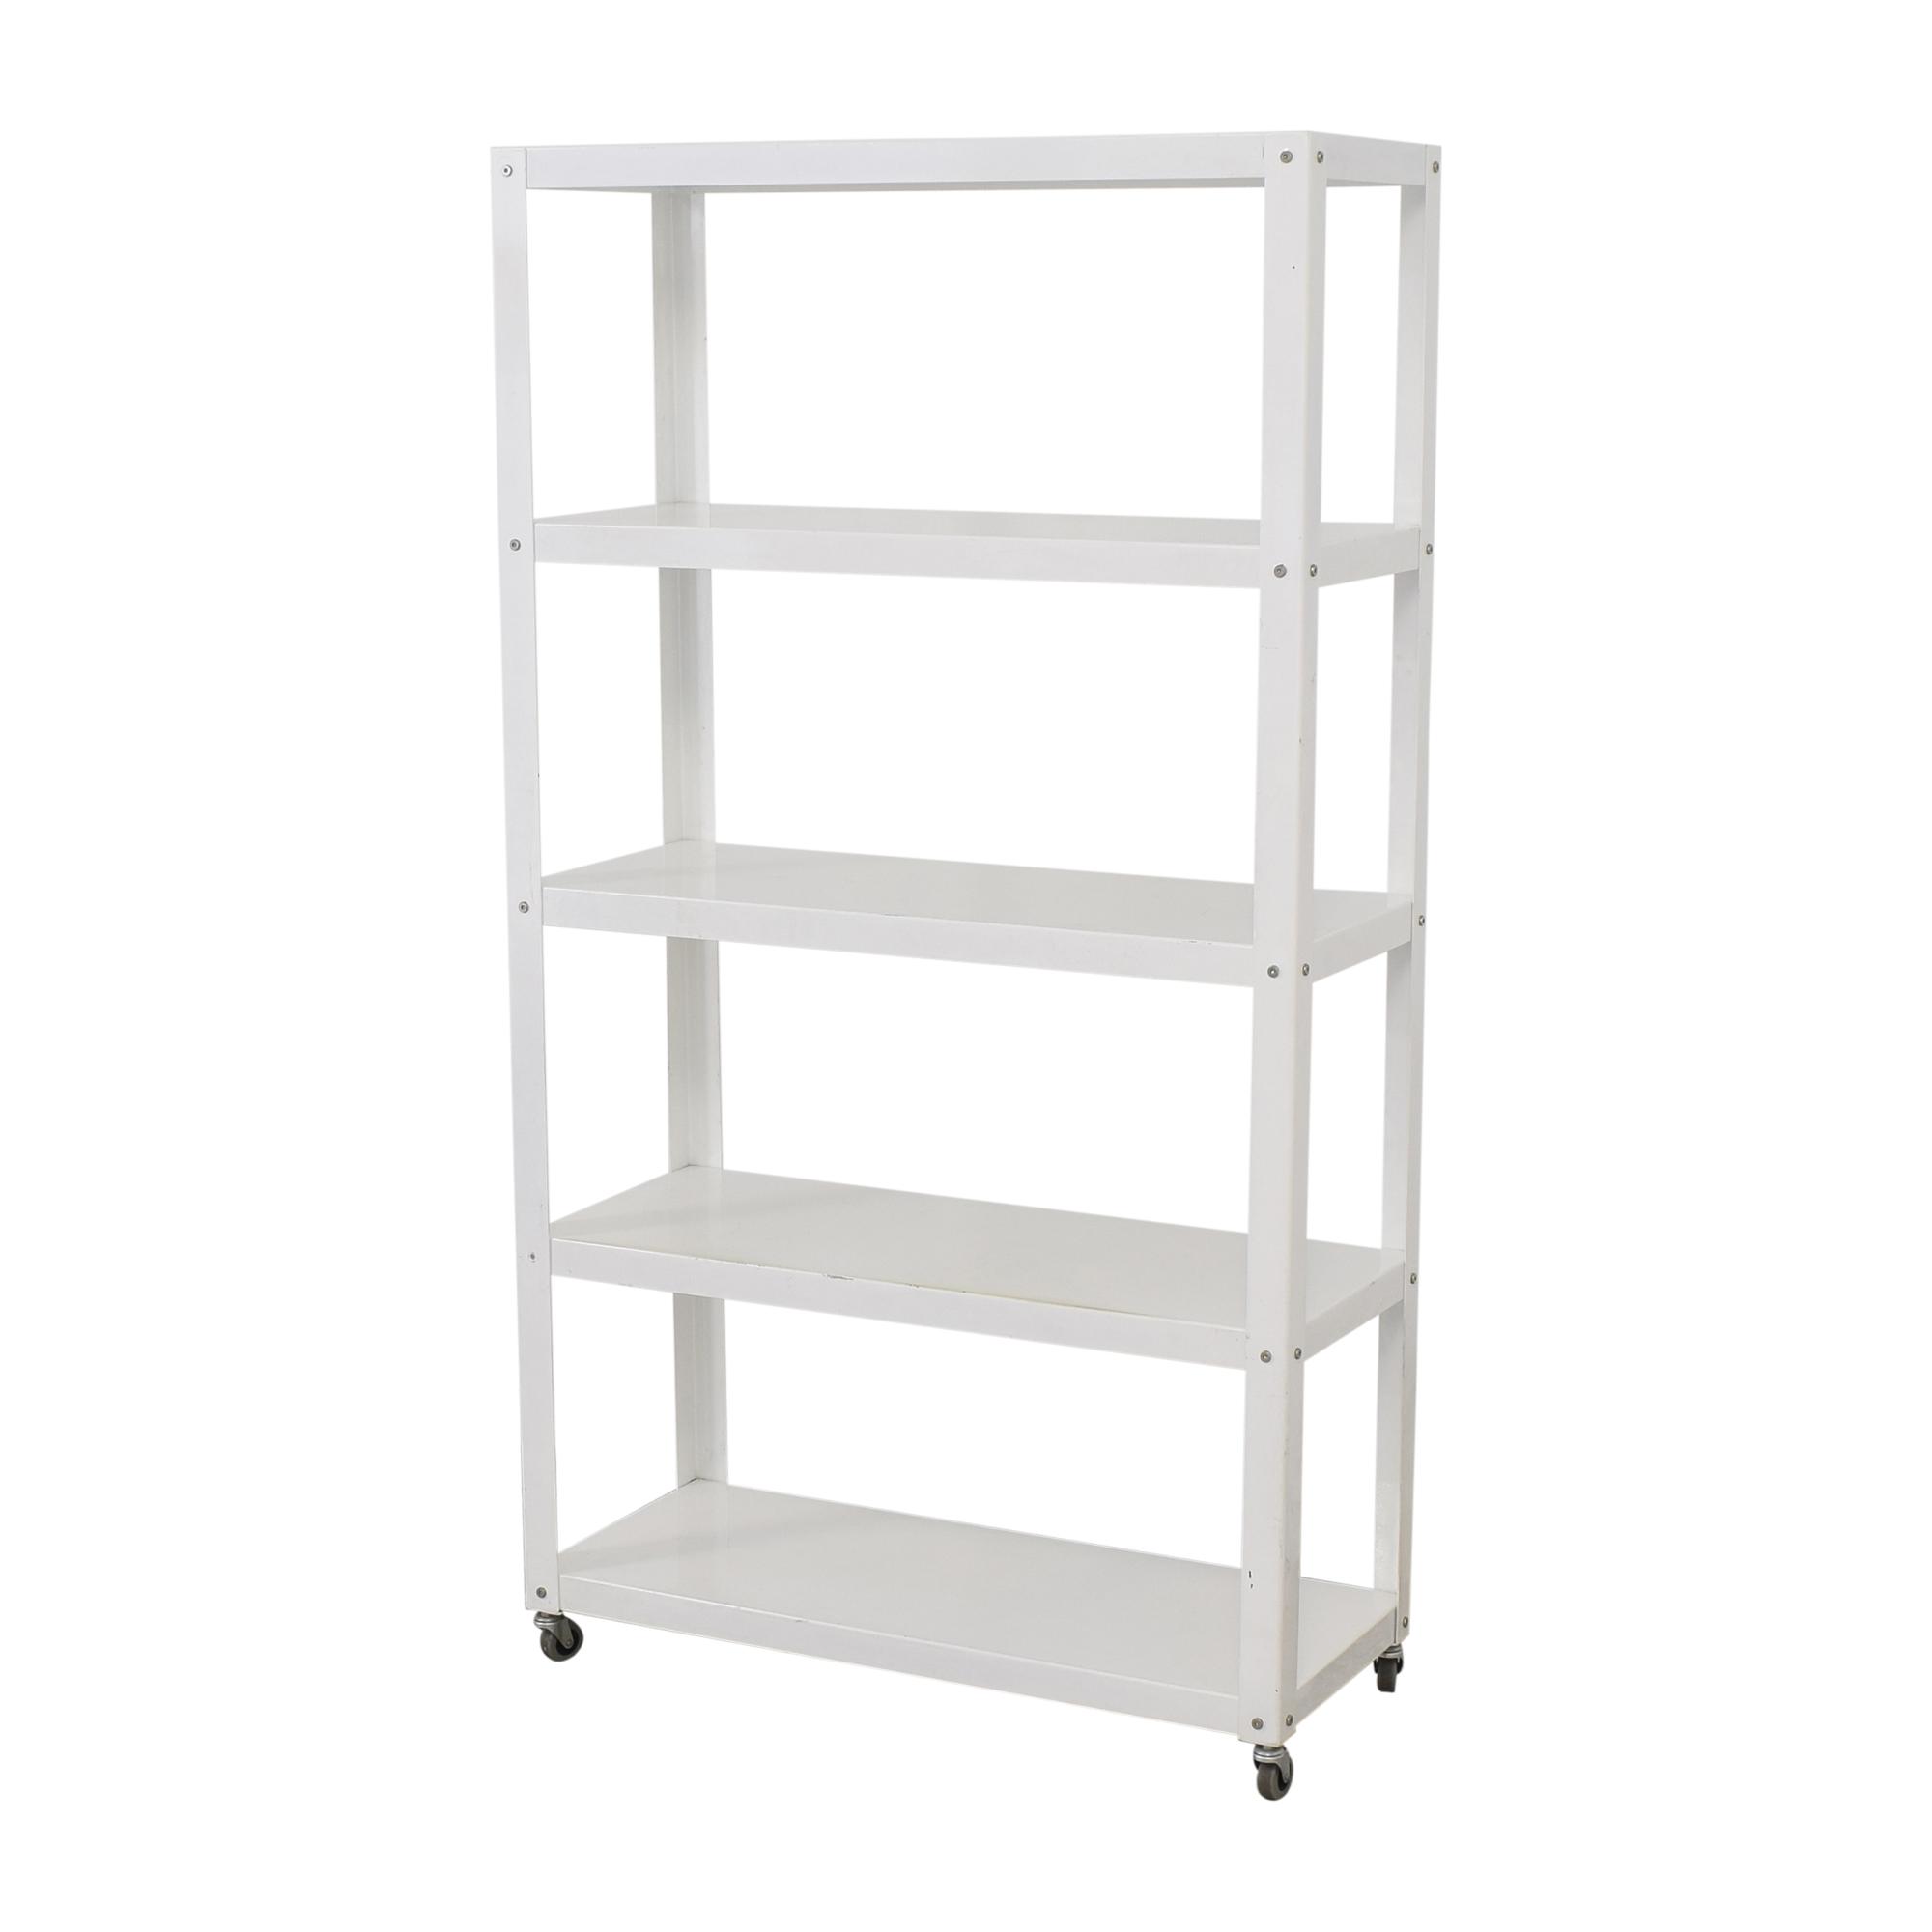 CB2 CB2 Rolling Shelf Unit Storage